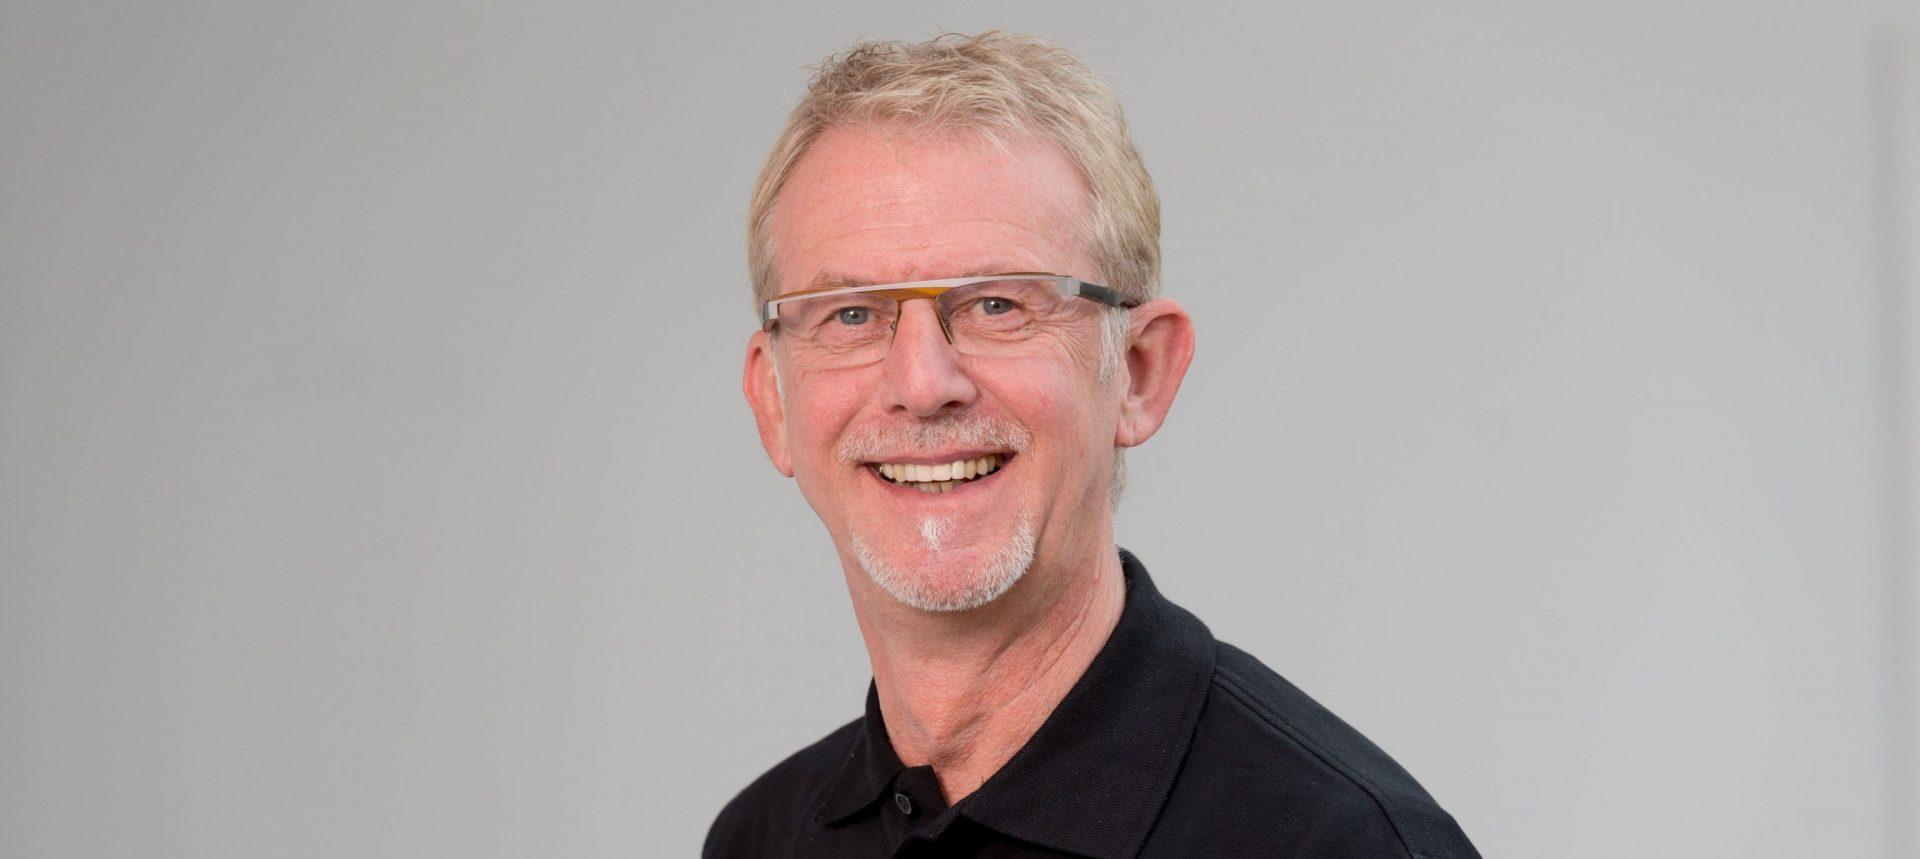 Dietmar Herrmann perma-trade permatrade Wassertechnik GmbH